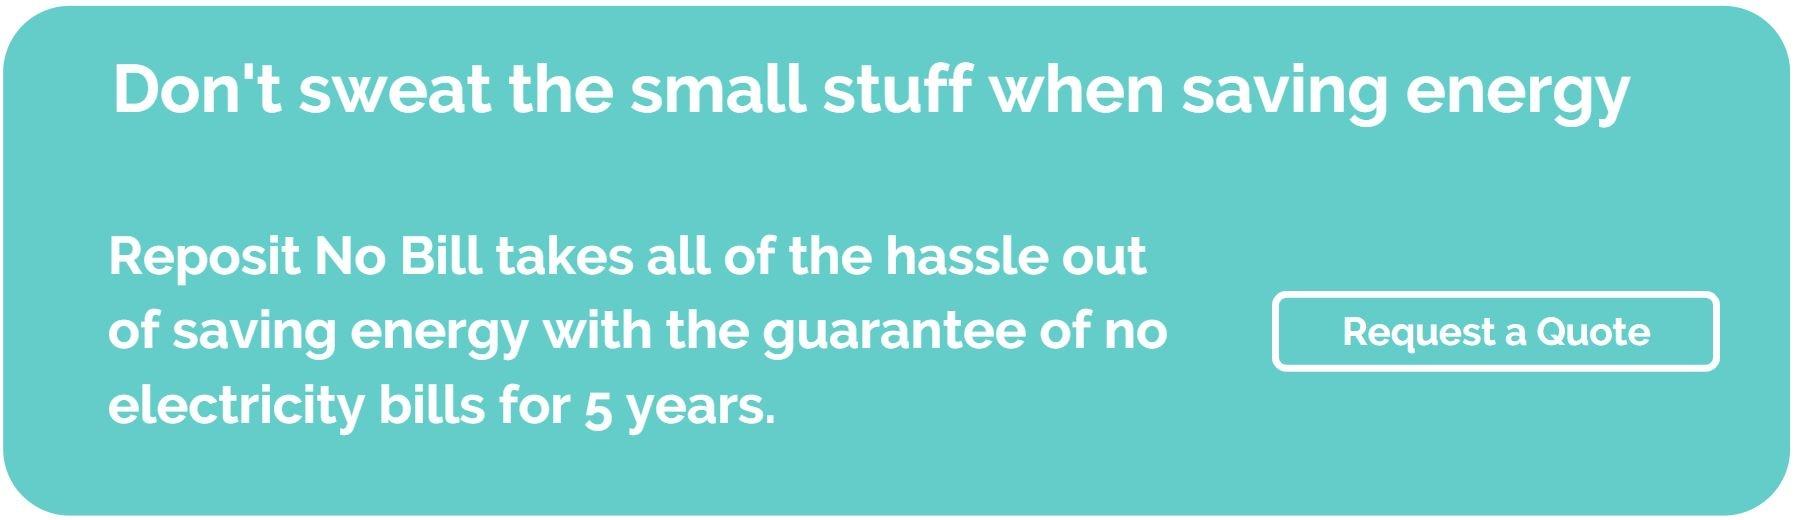 Dont sweat the small stuff - large image